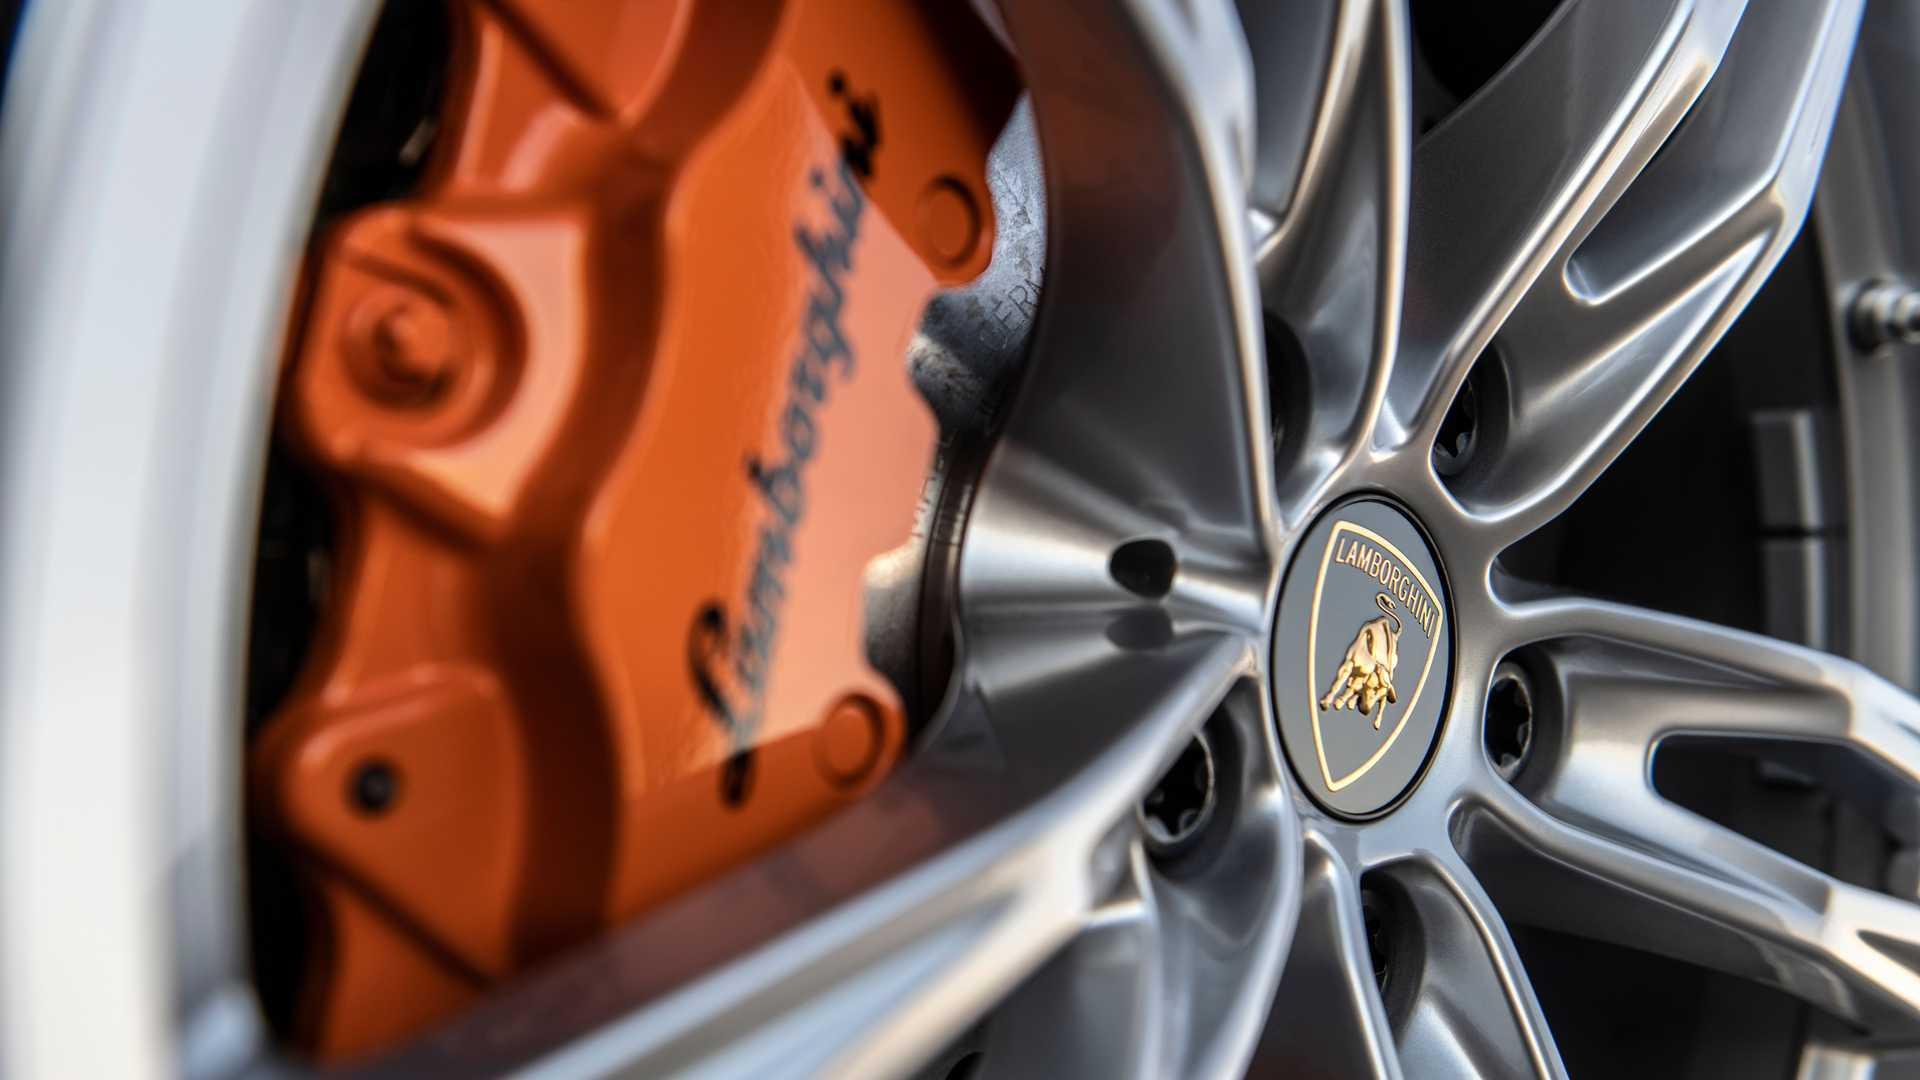 2020 Lamborghini Huracan Evo RWD center cap